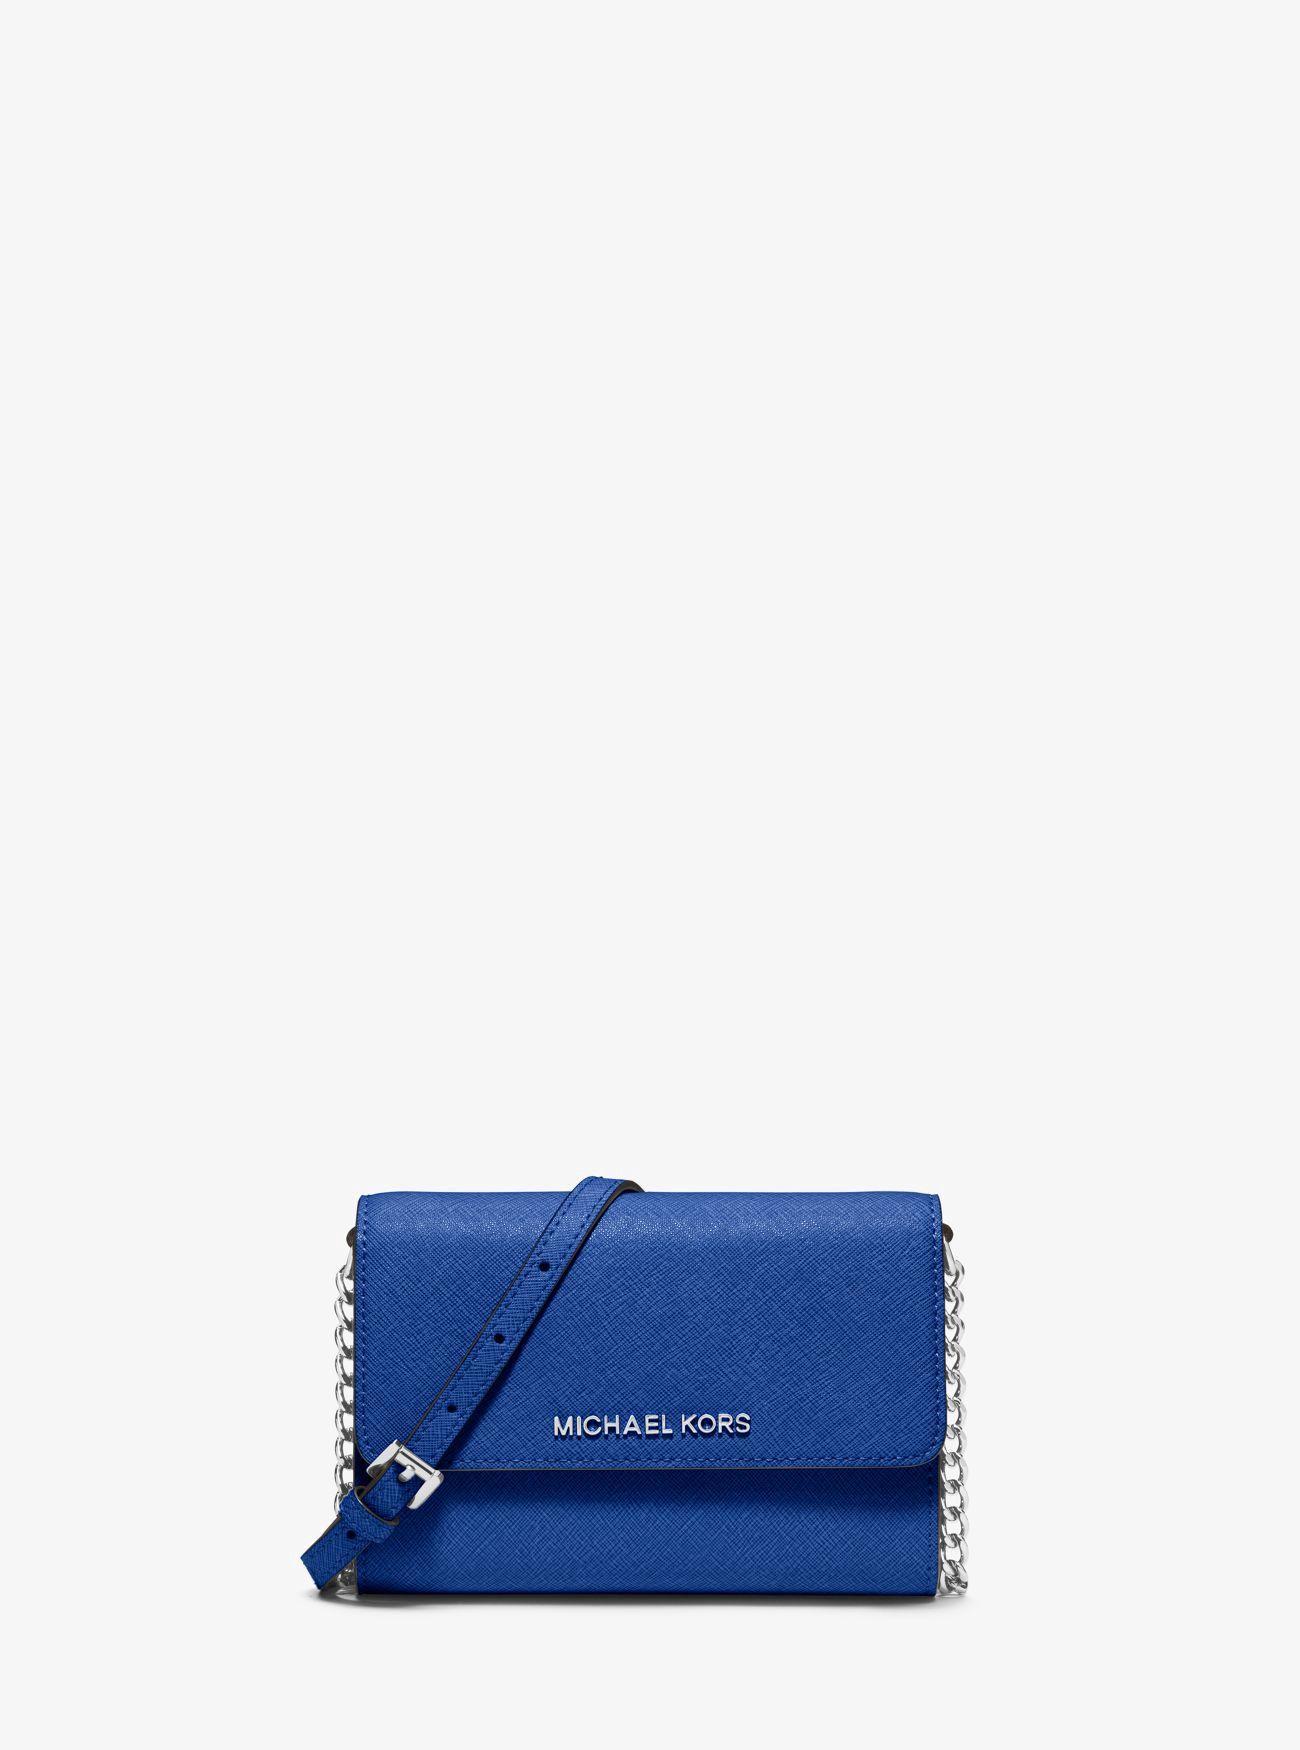 790ec884a7ef MICHAEL KORS Jet Set Travel Saffiano Leather Smartphone Crossbody.  #michaelkors #bags #shoulder bags #leather #polyester #crossbody #lining #